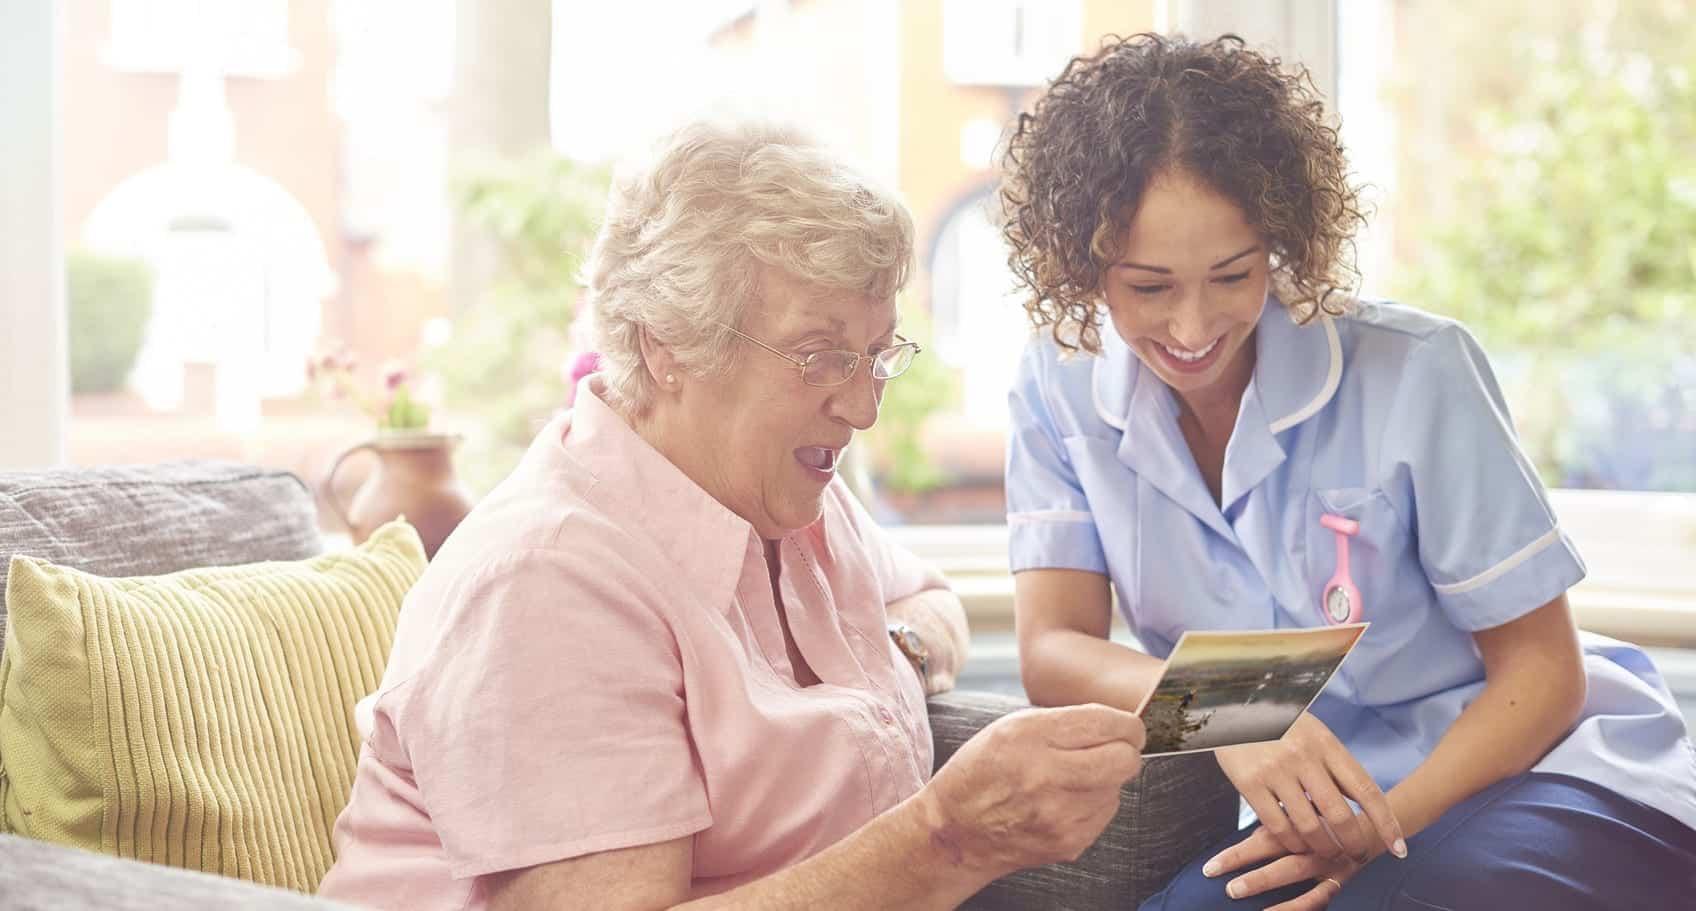 Nurse Spending Time With Elderly Resident At Nursing Home